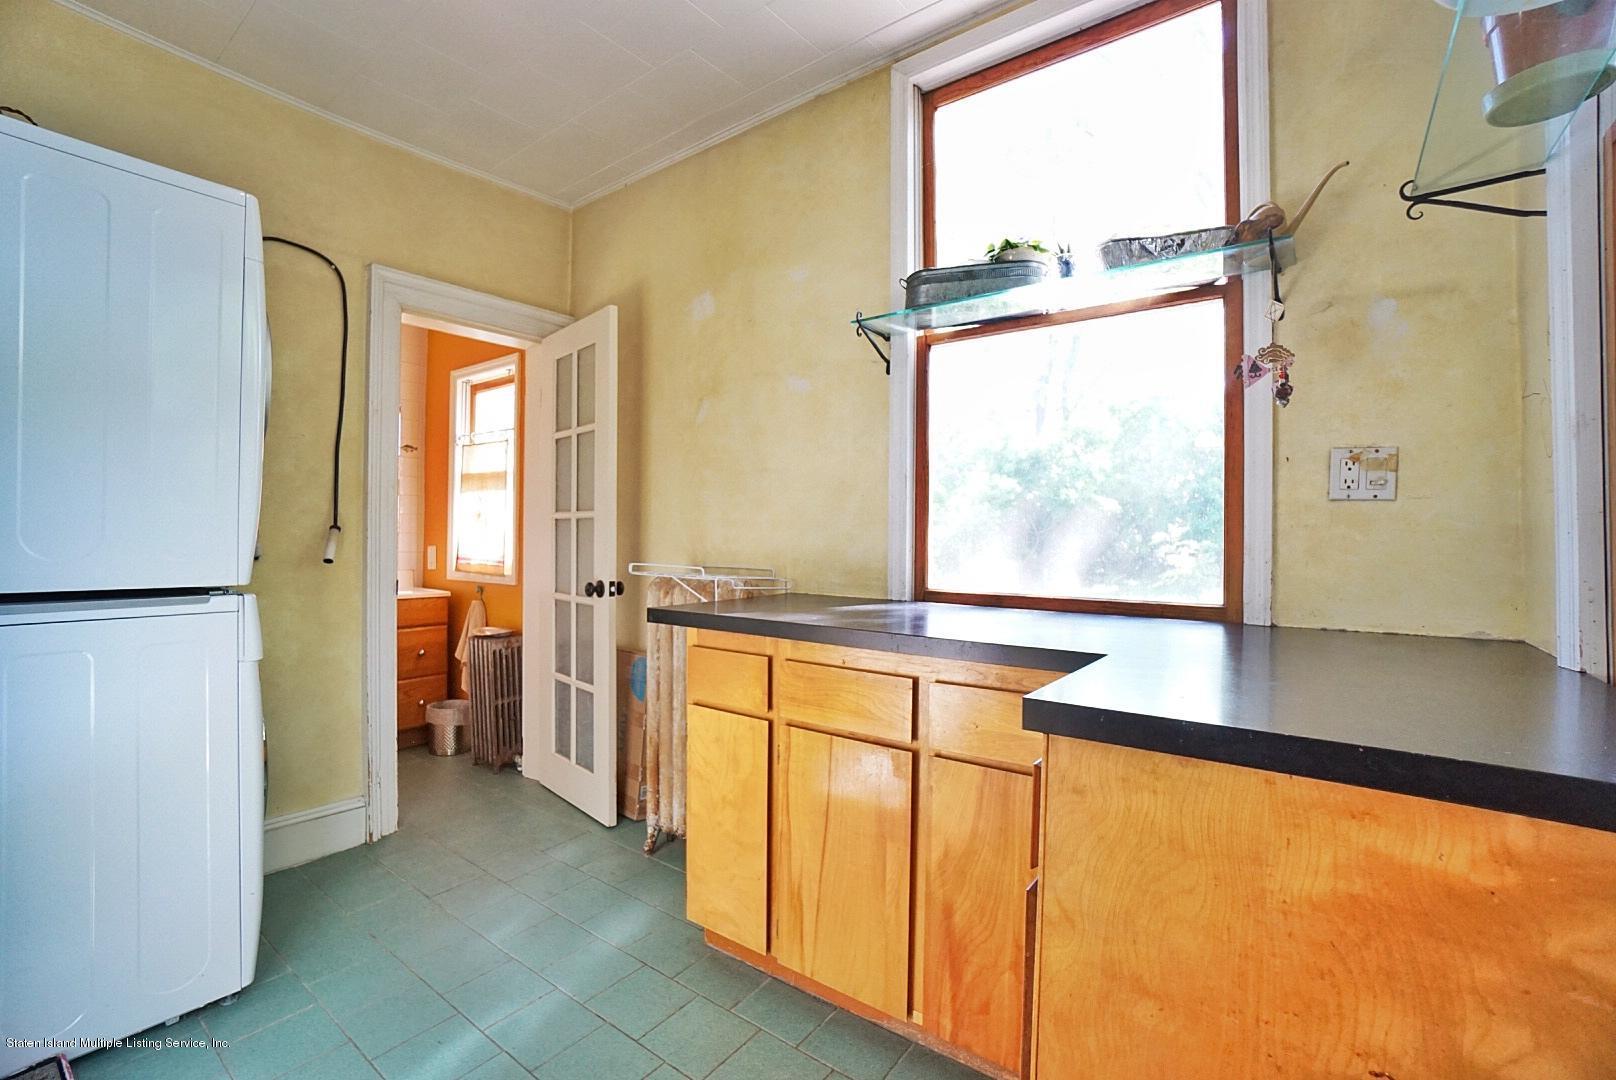 Two Family - Detached 117 Tysen Street  Staten Island, NY 10301, MLS-1128408-17